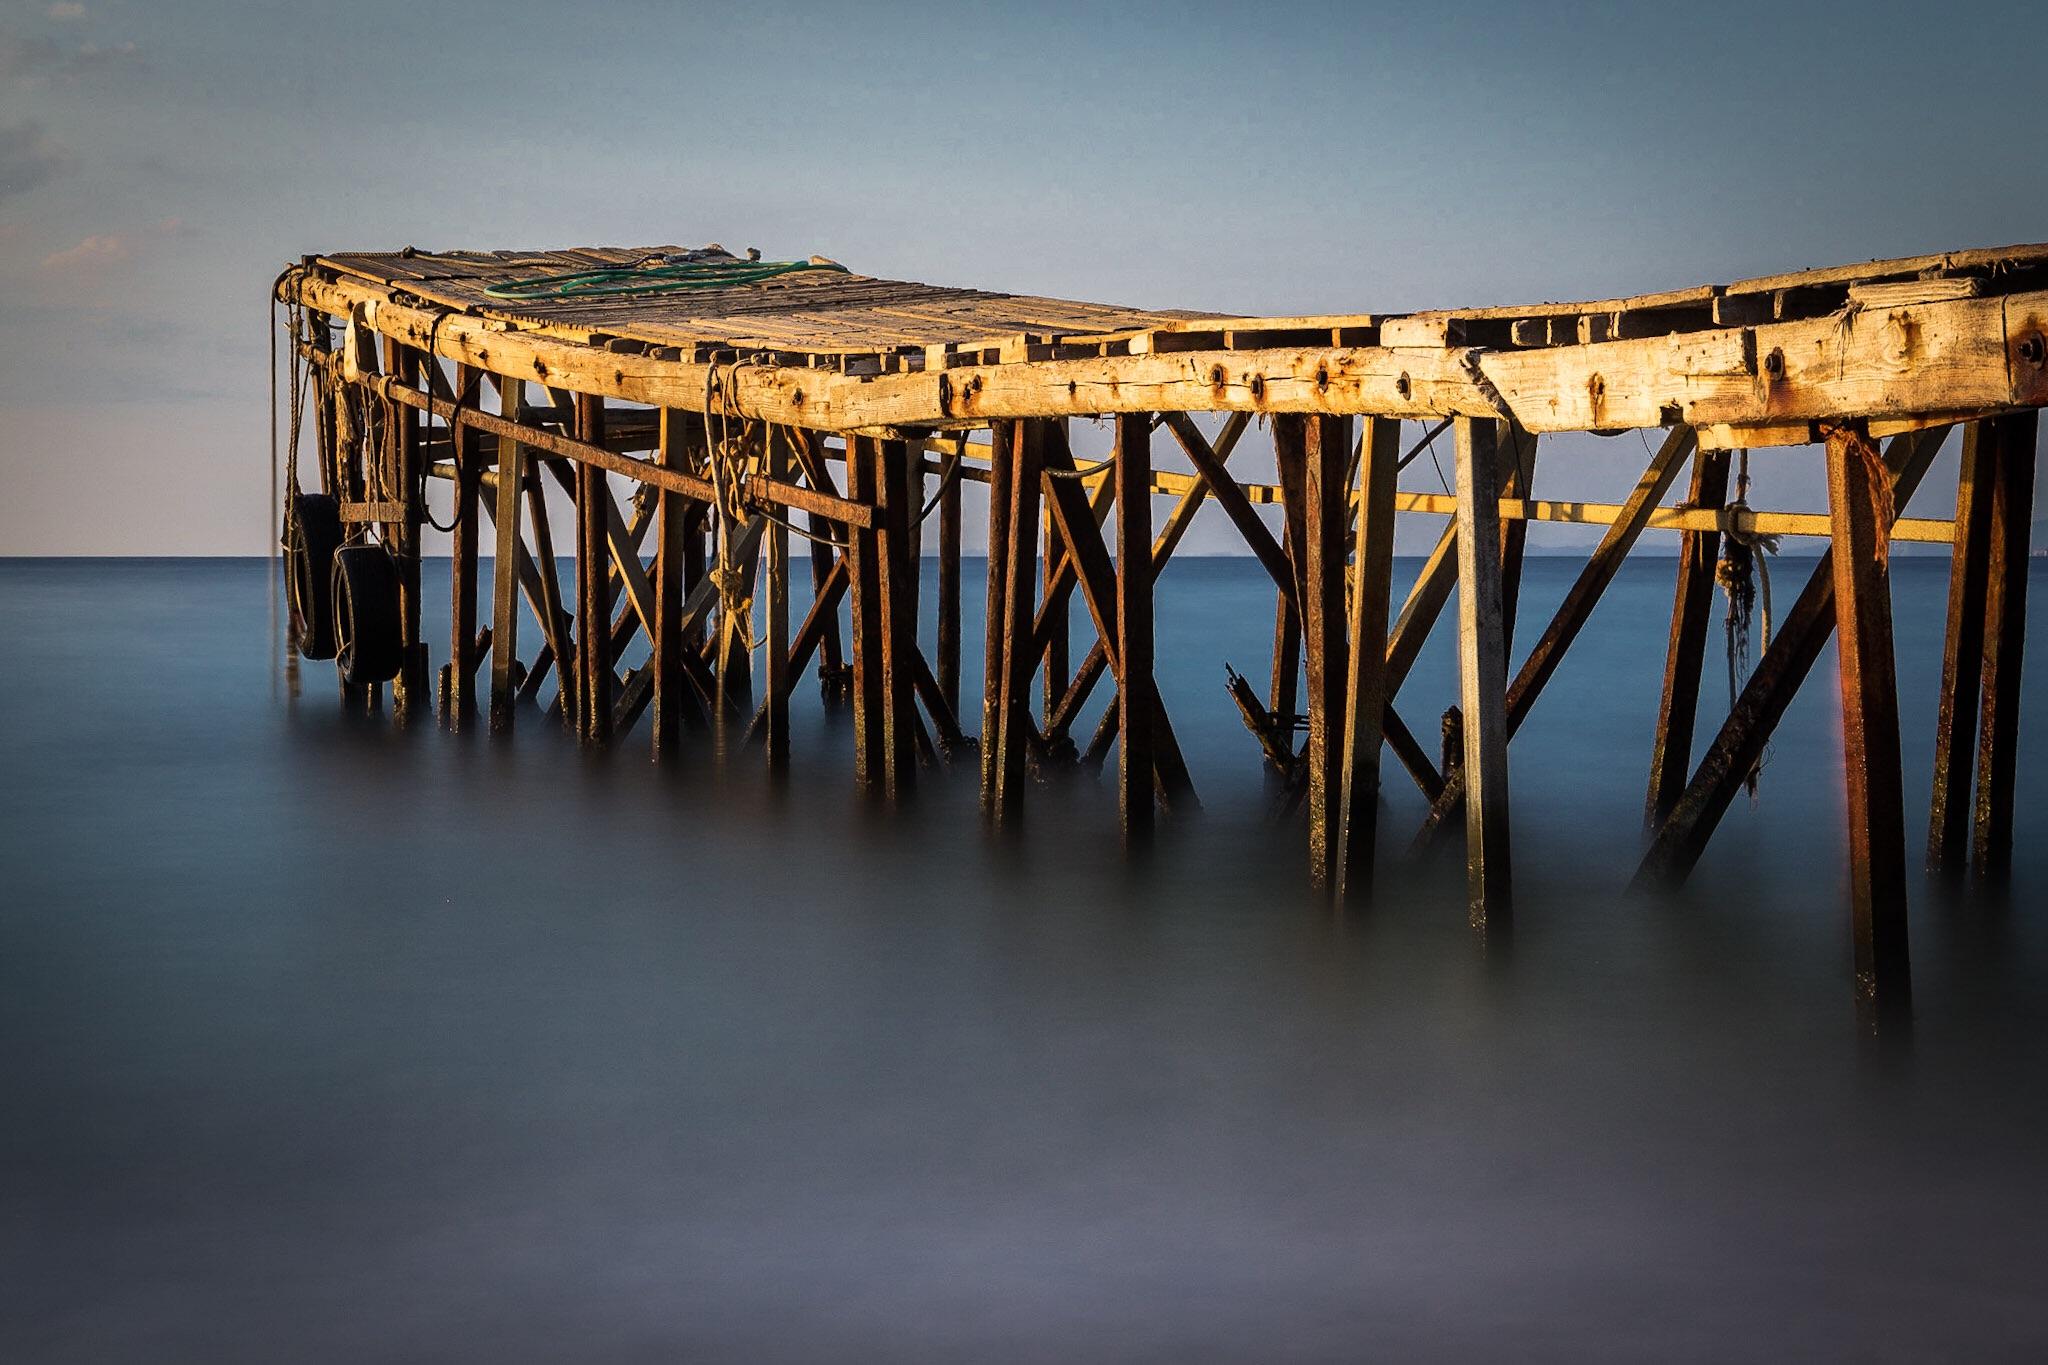 Picture of the jetty at Nissaki Beach in Corfu